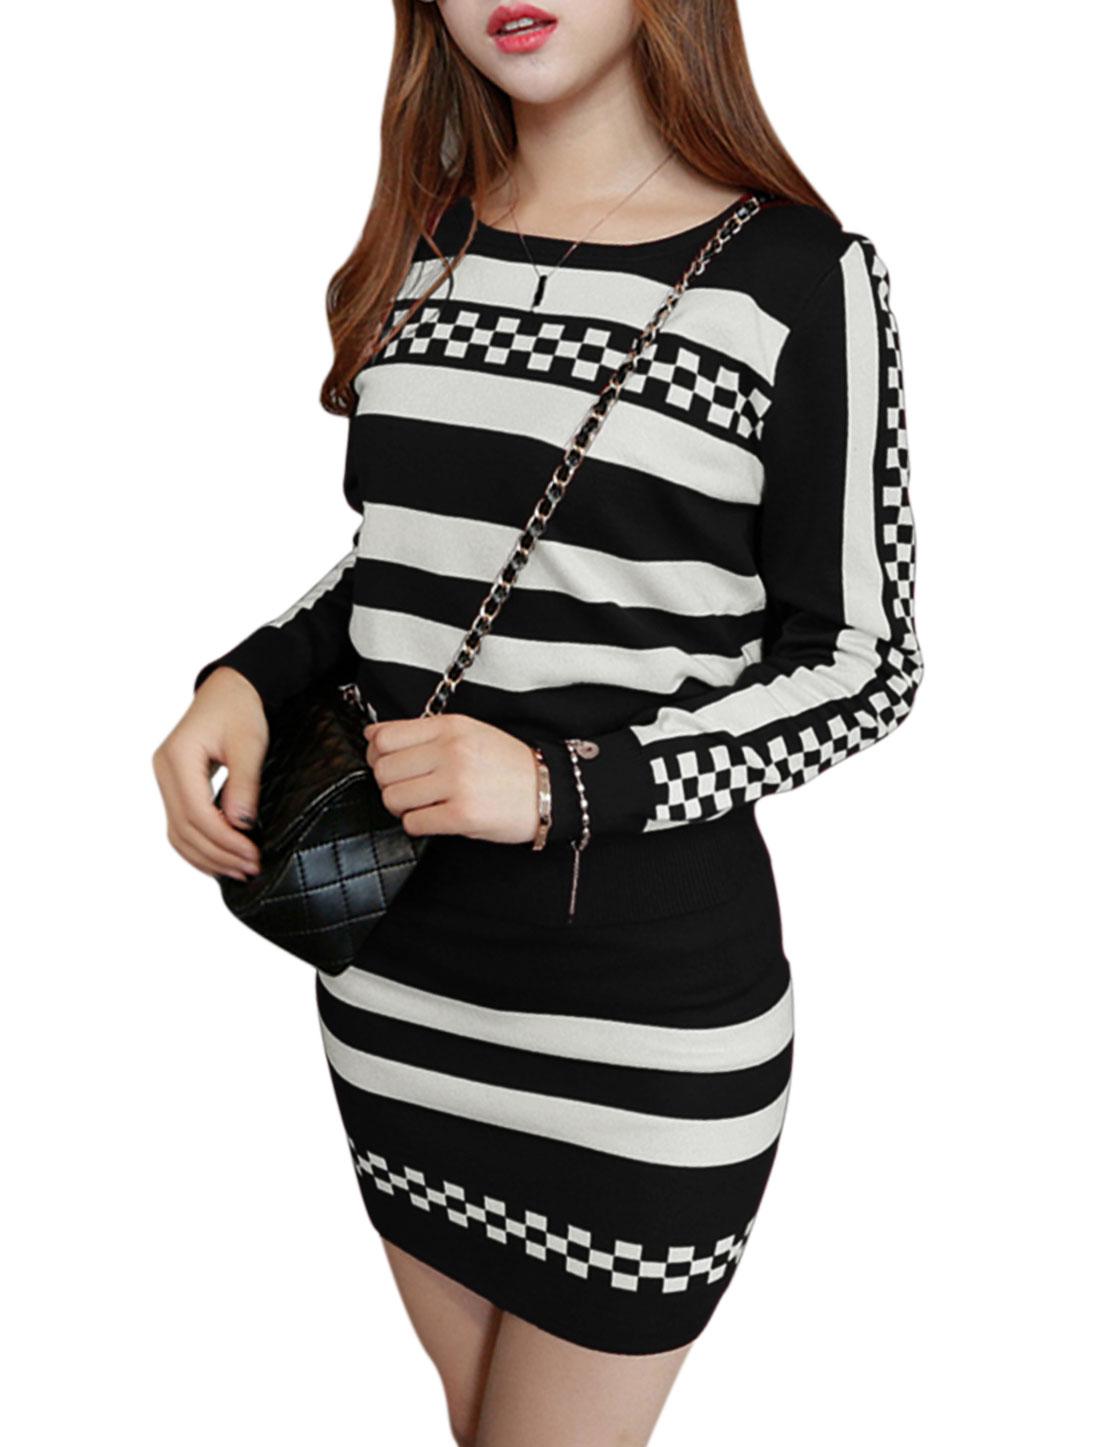 Women Long Sleeve Jumper w Plaids Stripes Knitted Skirt Set Black XS